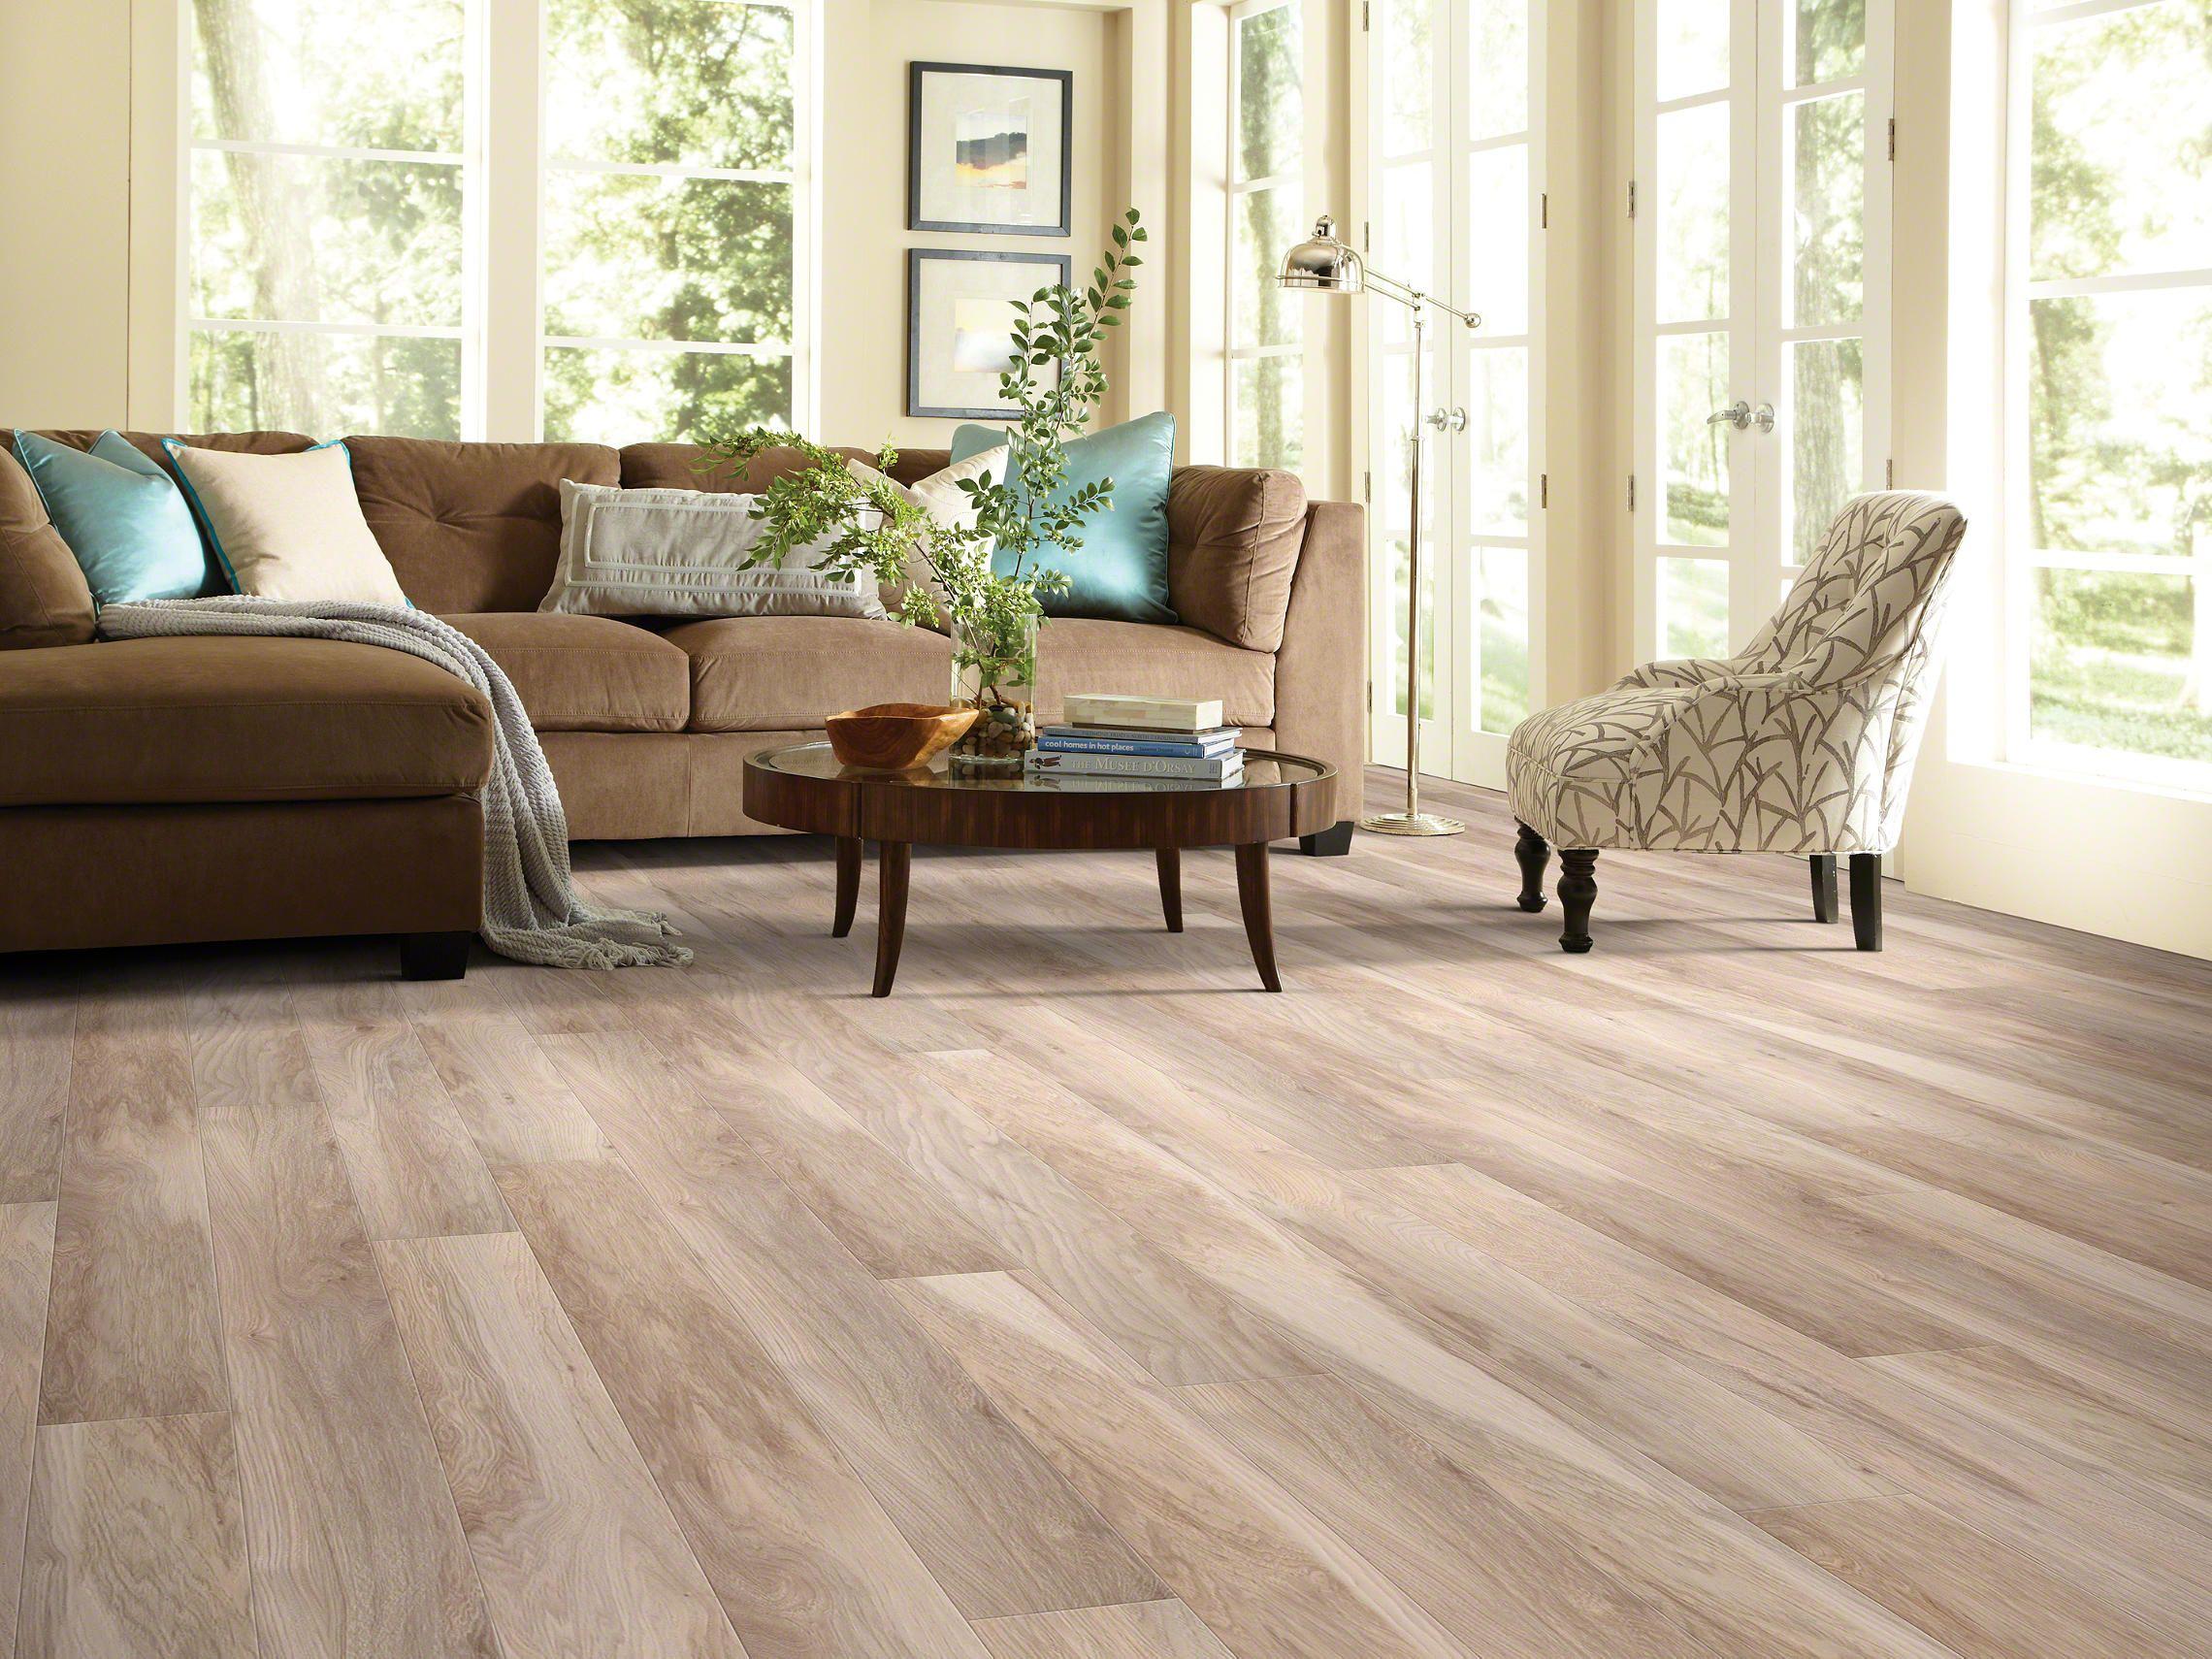 Laminate Flooring Wood Laminate Floors Laminate